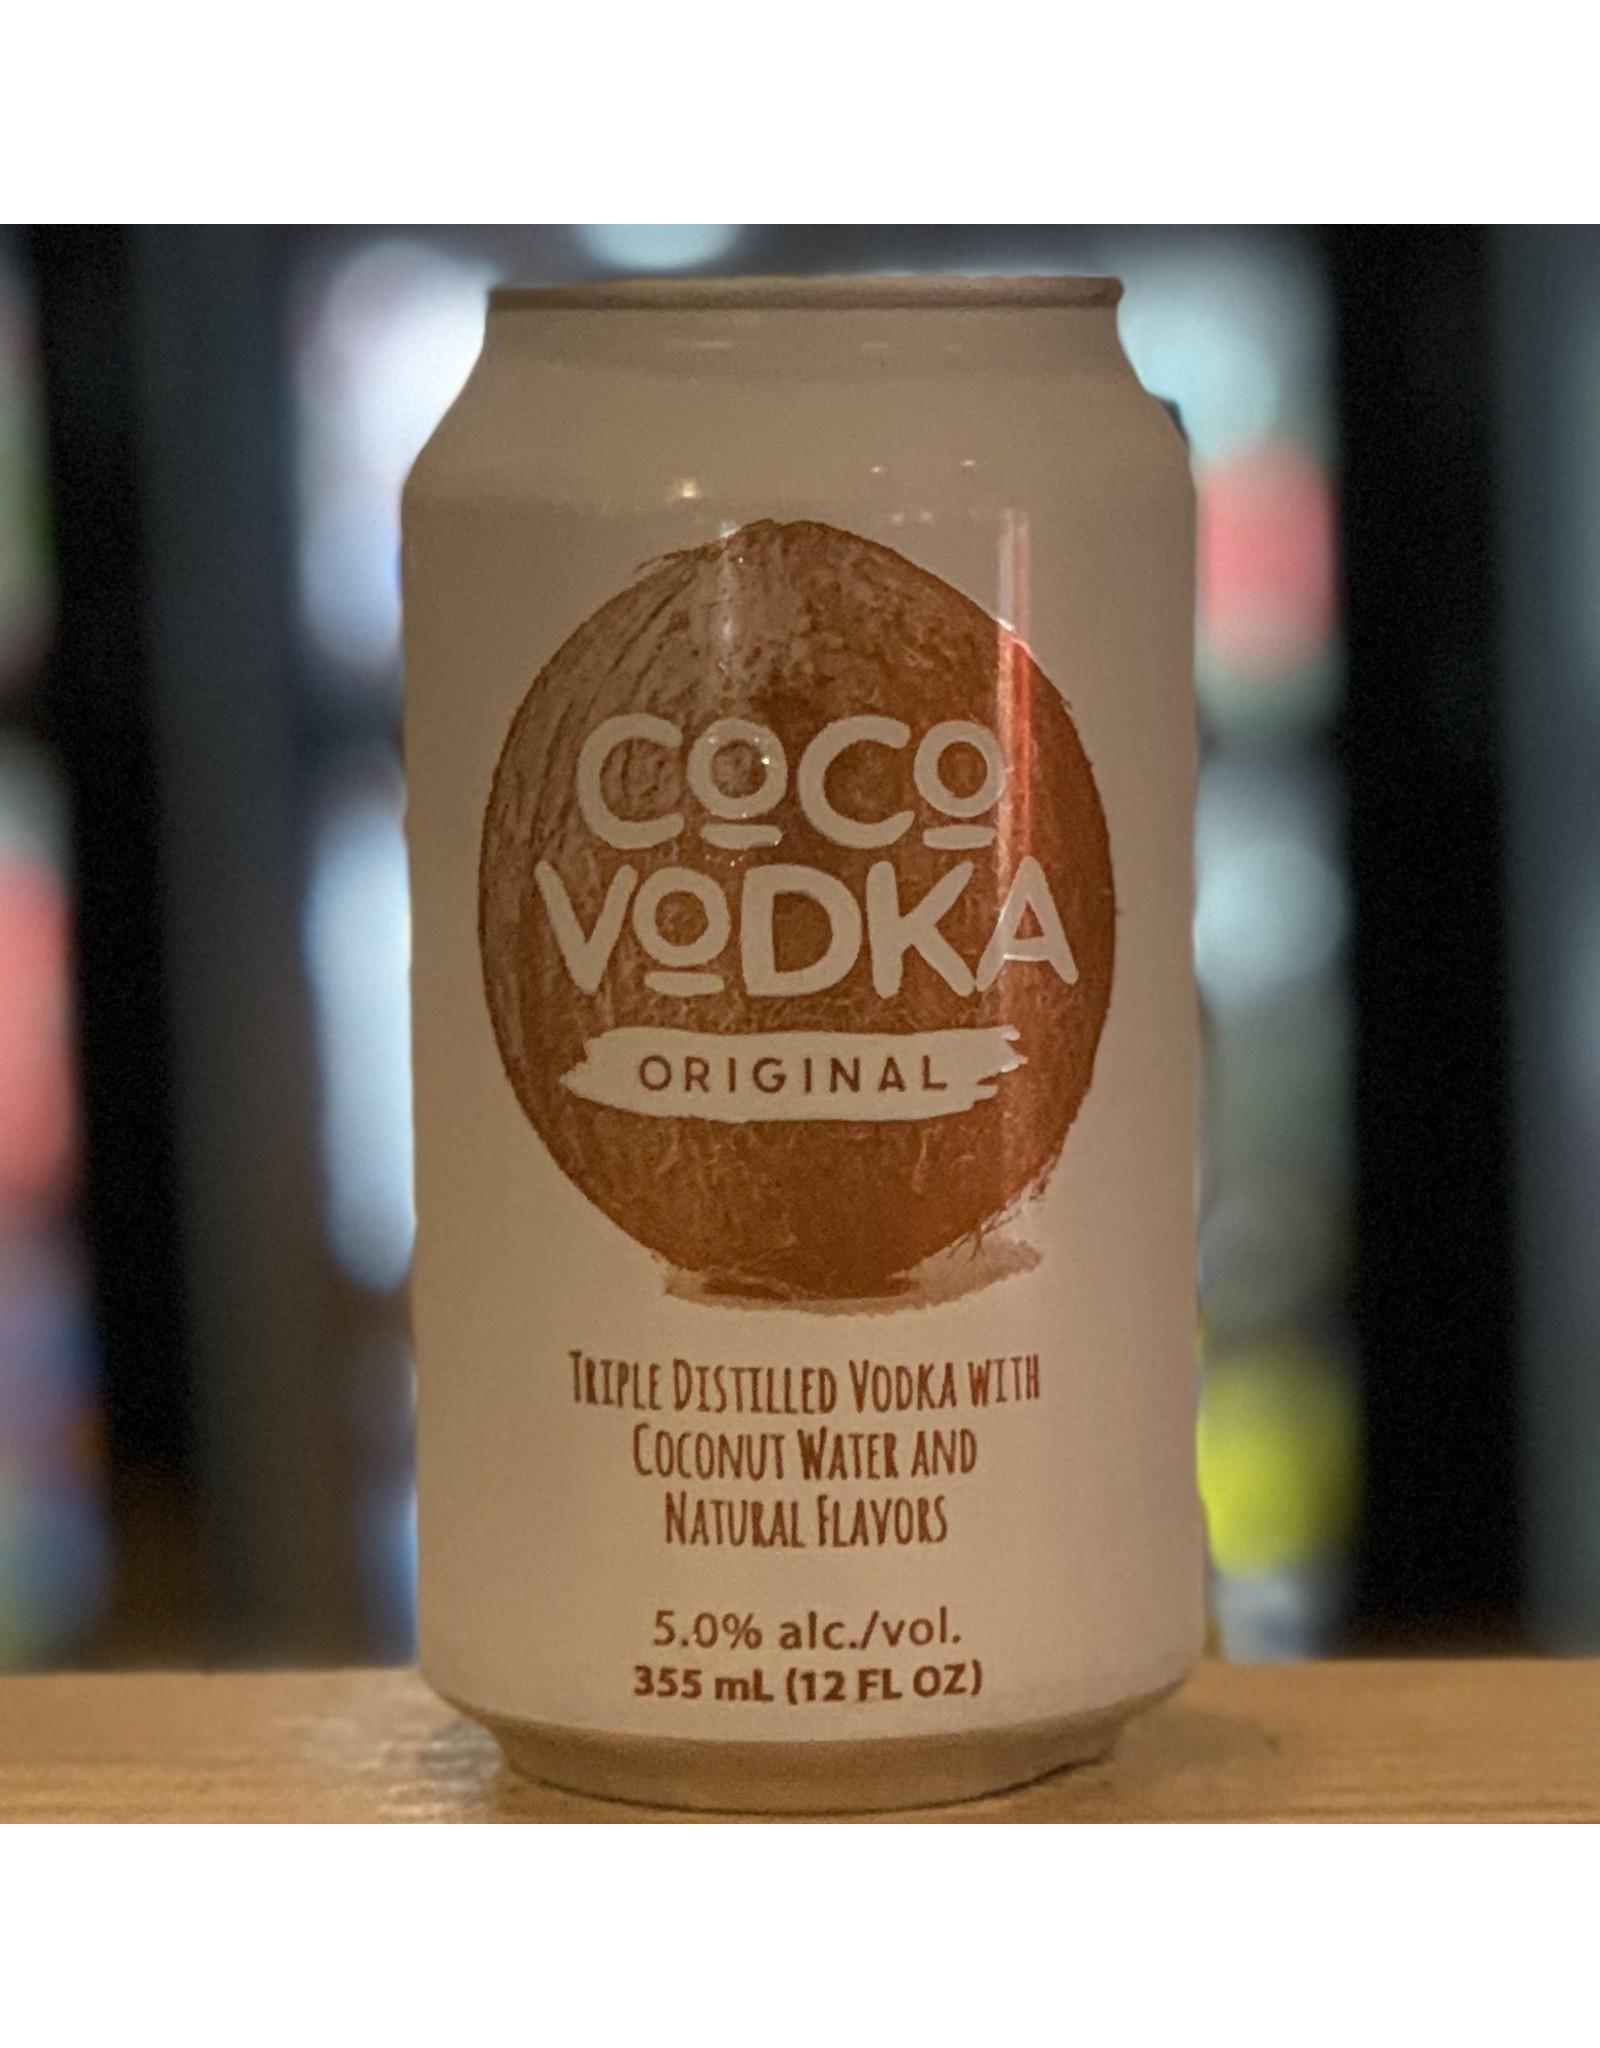 RTD Bondi Distillery ''Coco Vodka'' Sparkling RTD Vodka and Coconut Water - Utica, NY